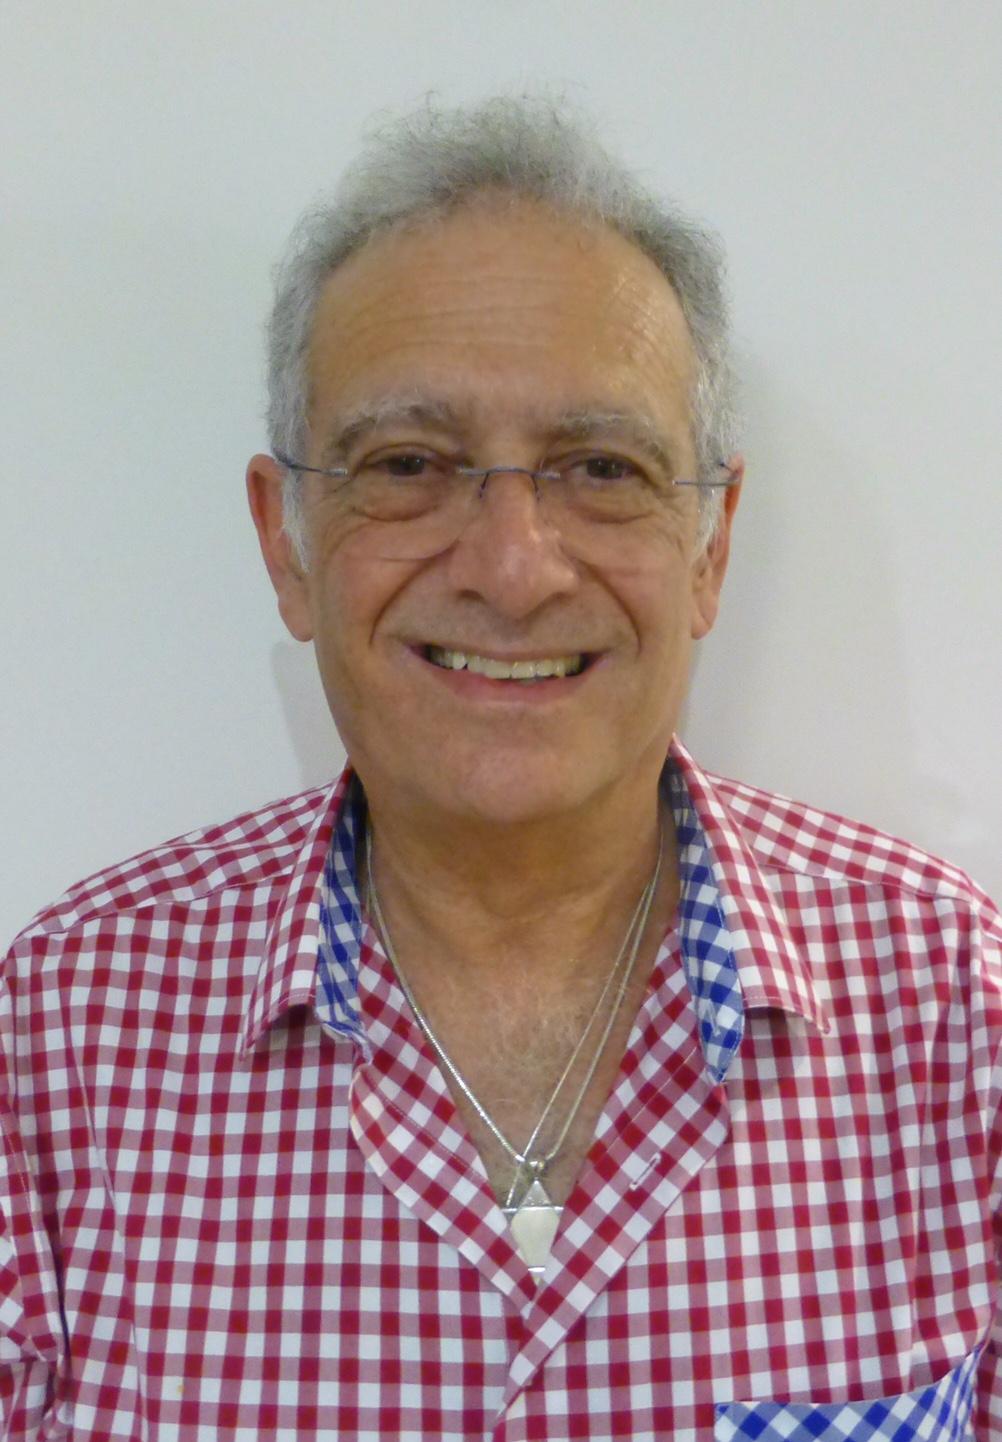 Morris Bersin